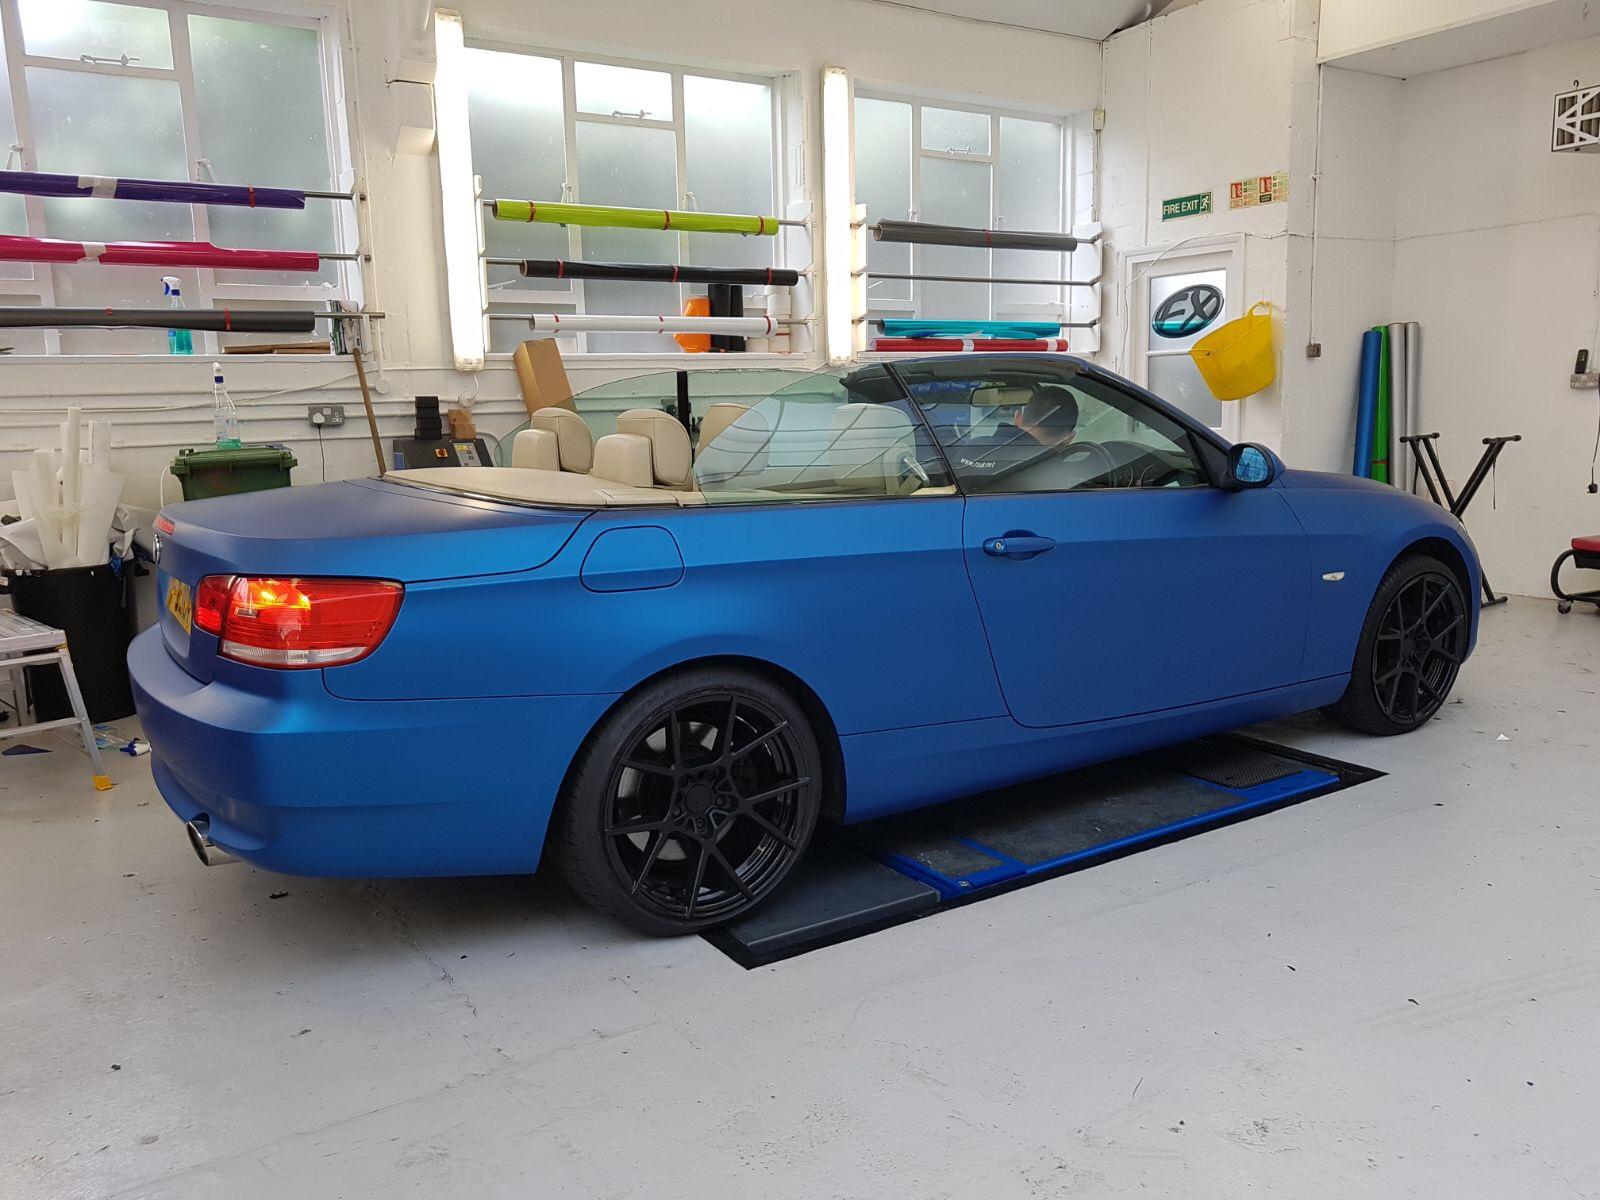 BMW SERIES Creative FX - Blue bmw 3 series